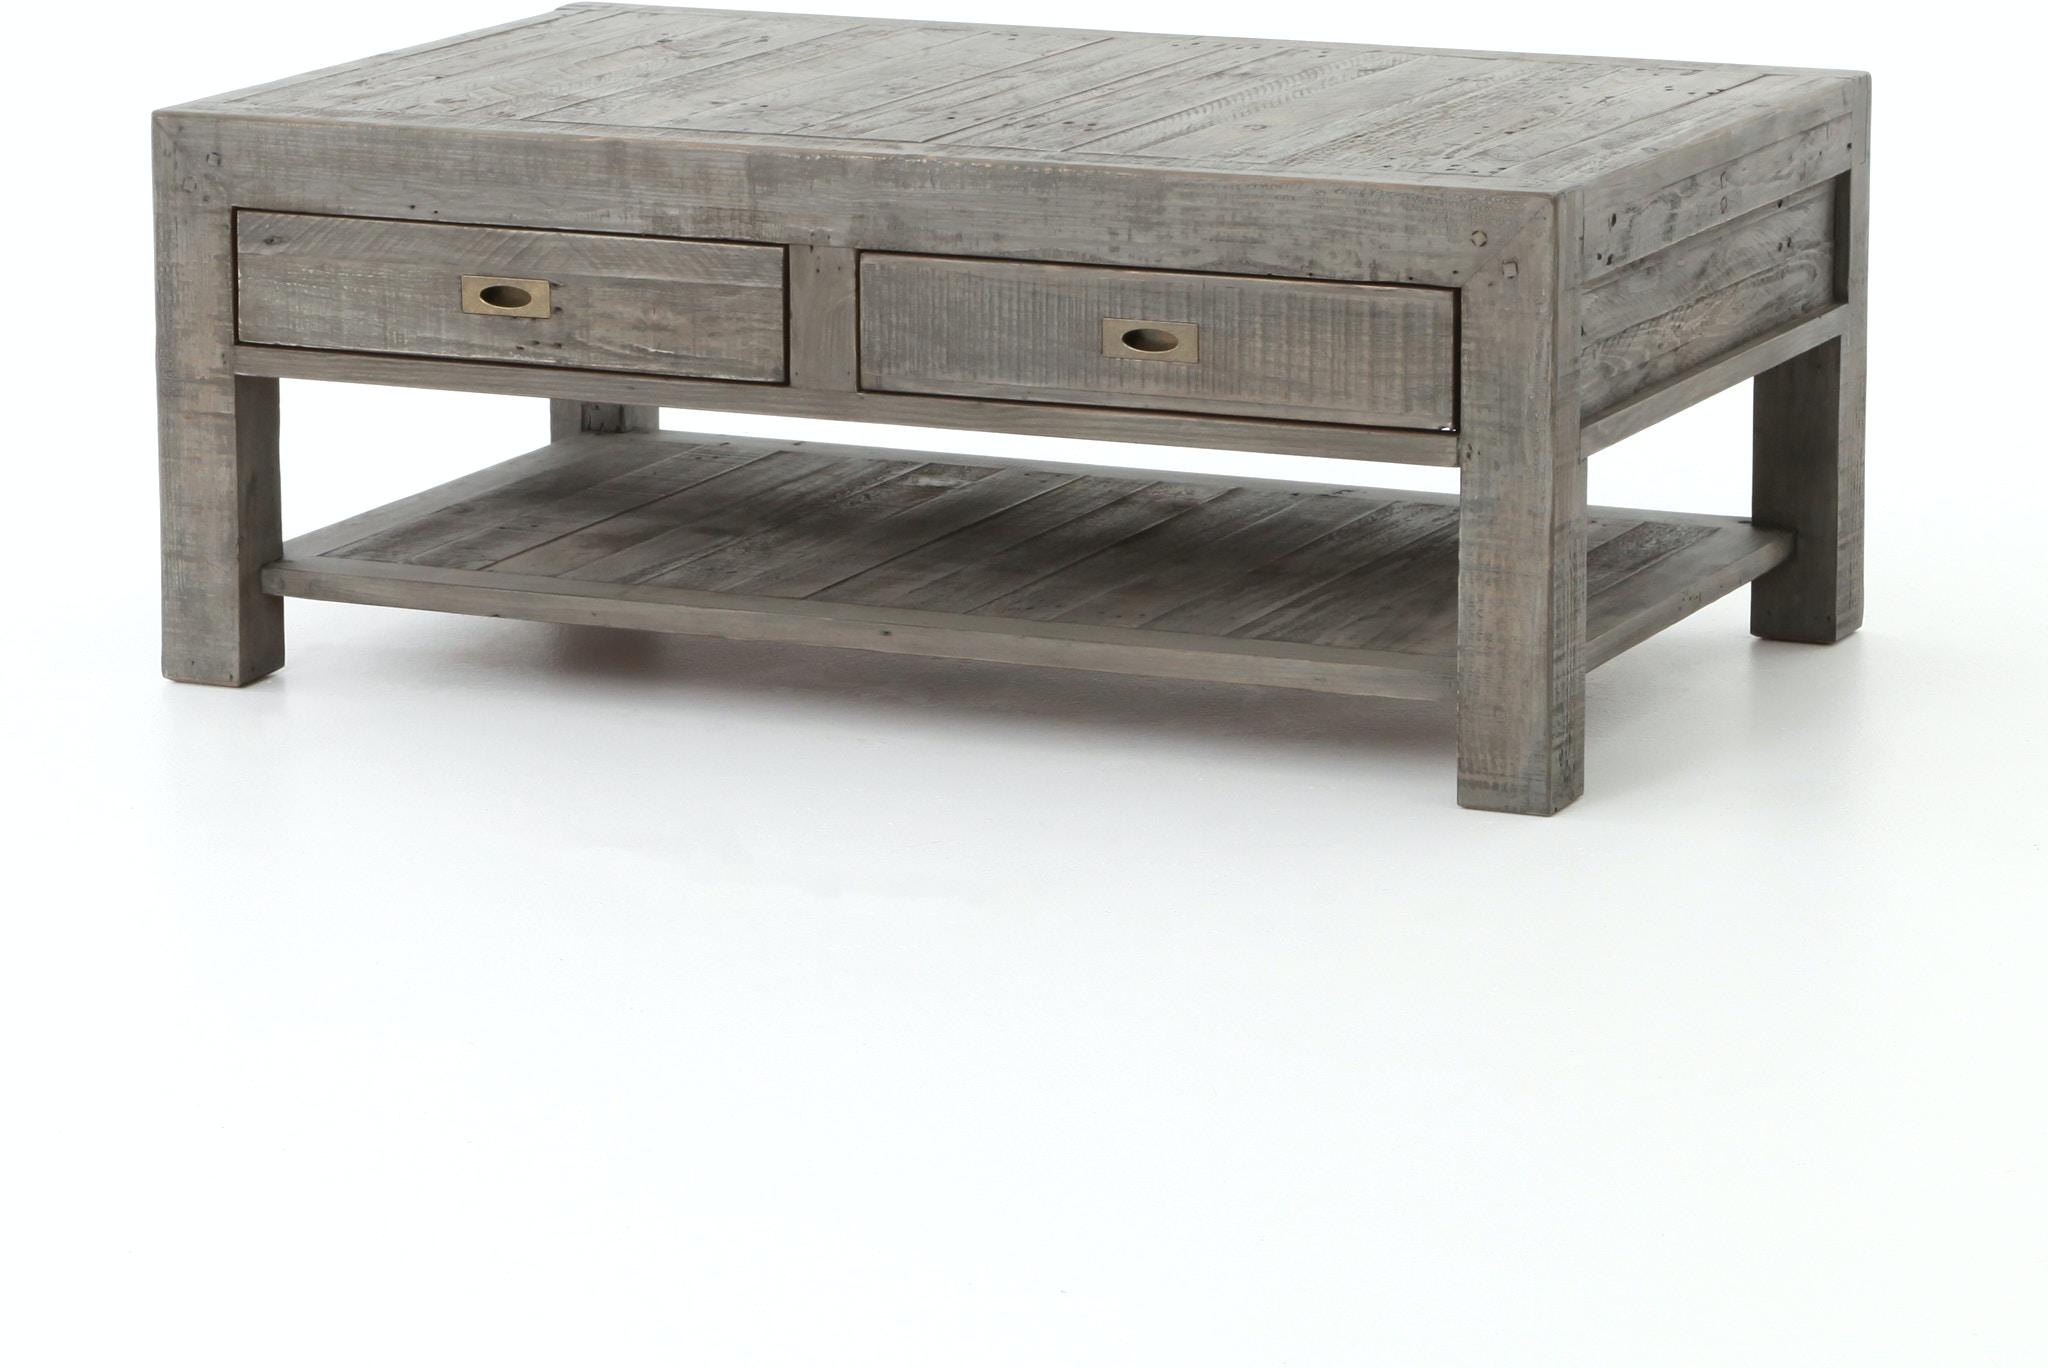 Four Hands Furniture VPRA 02 55 Living Room POST & RAIL COFFEE